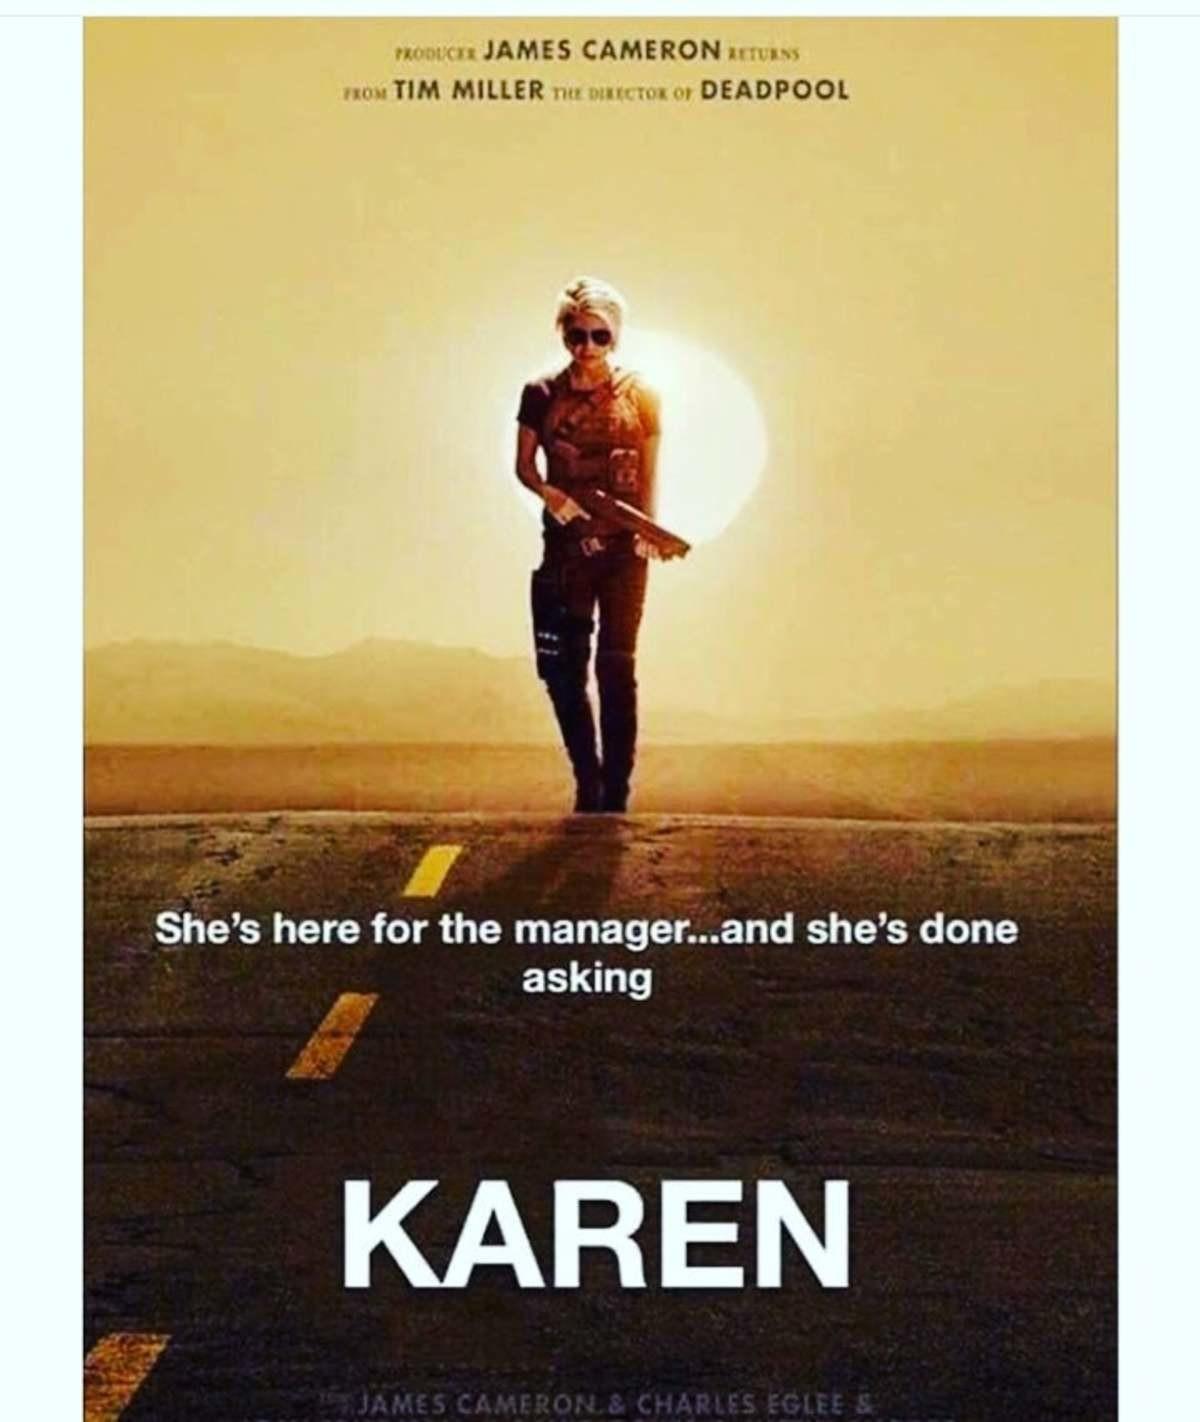 Trmnntr. .. Karens got a three shot shorty and minimal body armor, i am not scared of karen